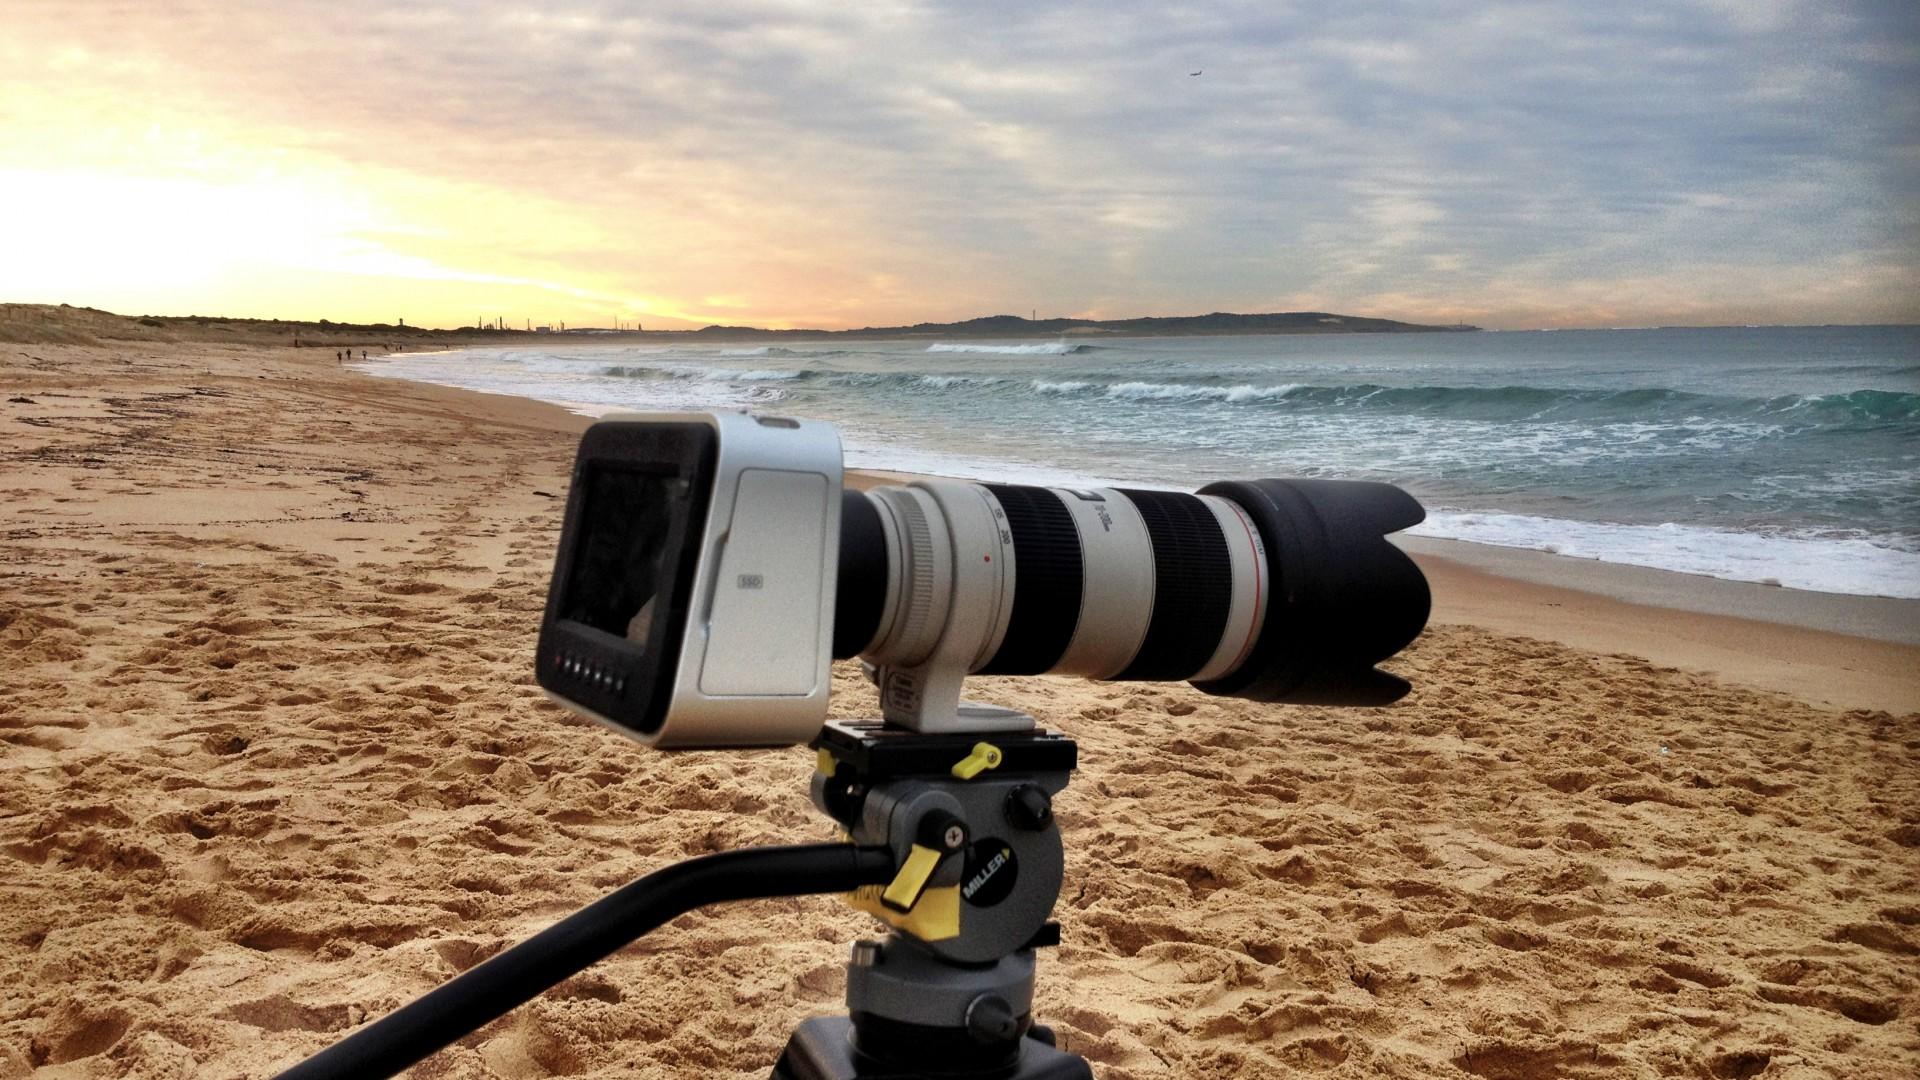 Wallpaper Blackmagic Design Production Camera 4k Best